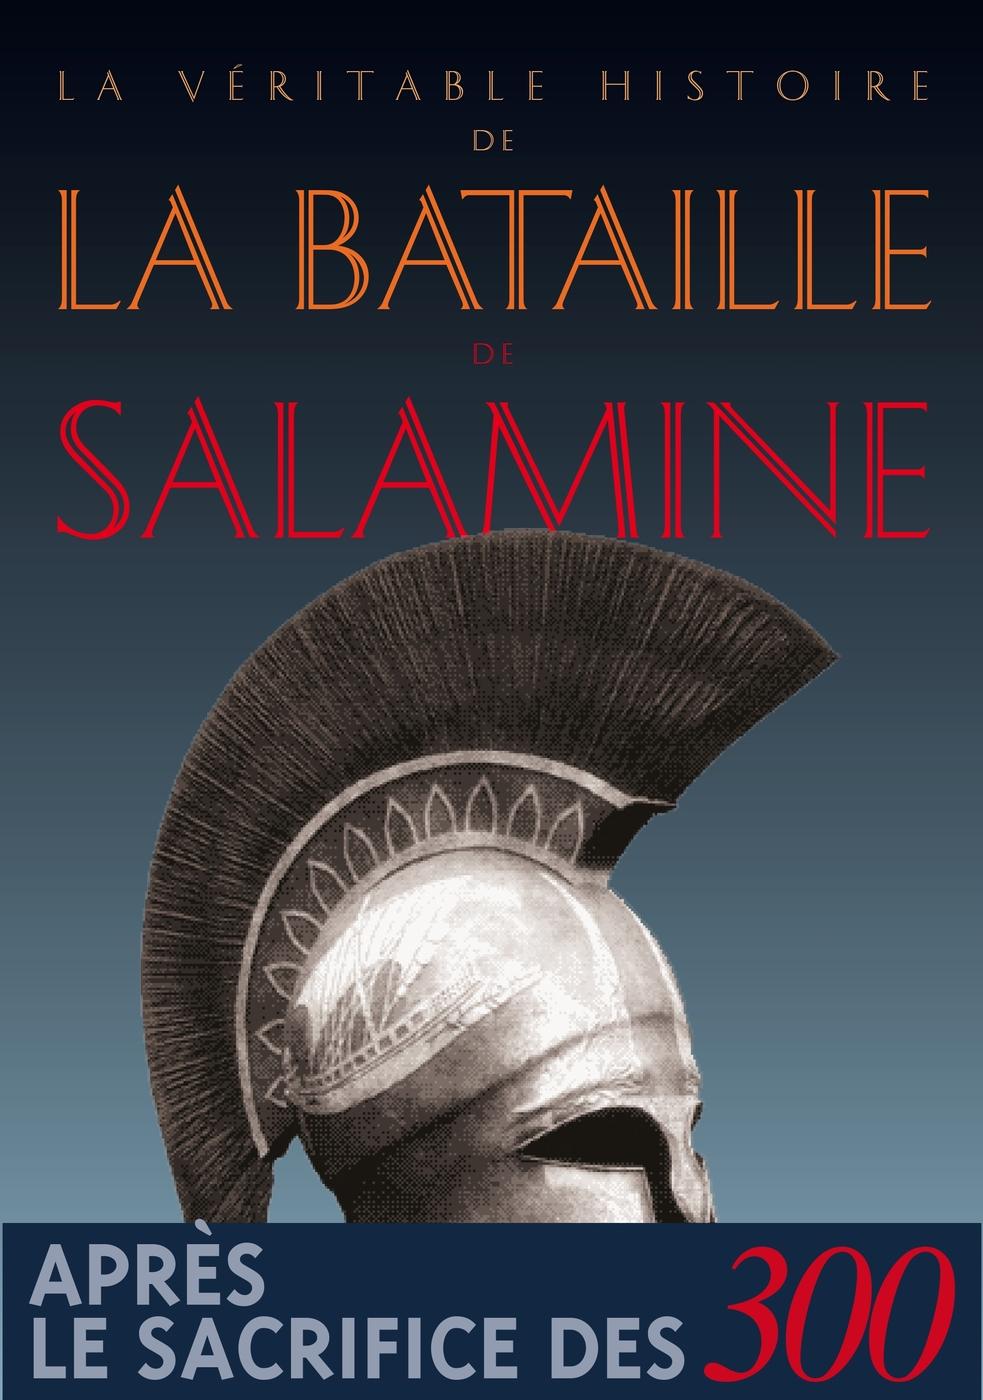 La V�ritable Histoire de la bataille de Salamine